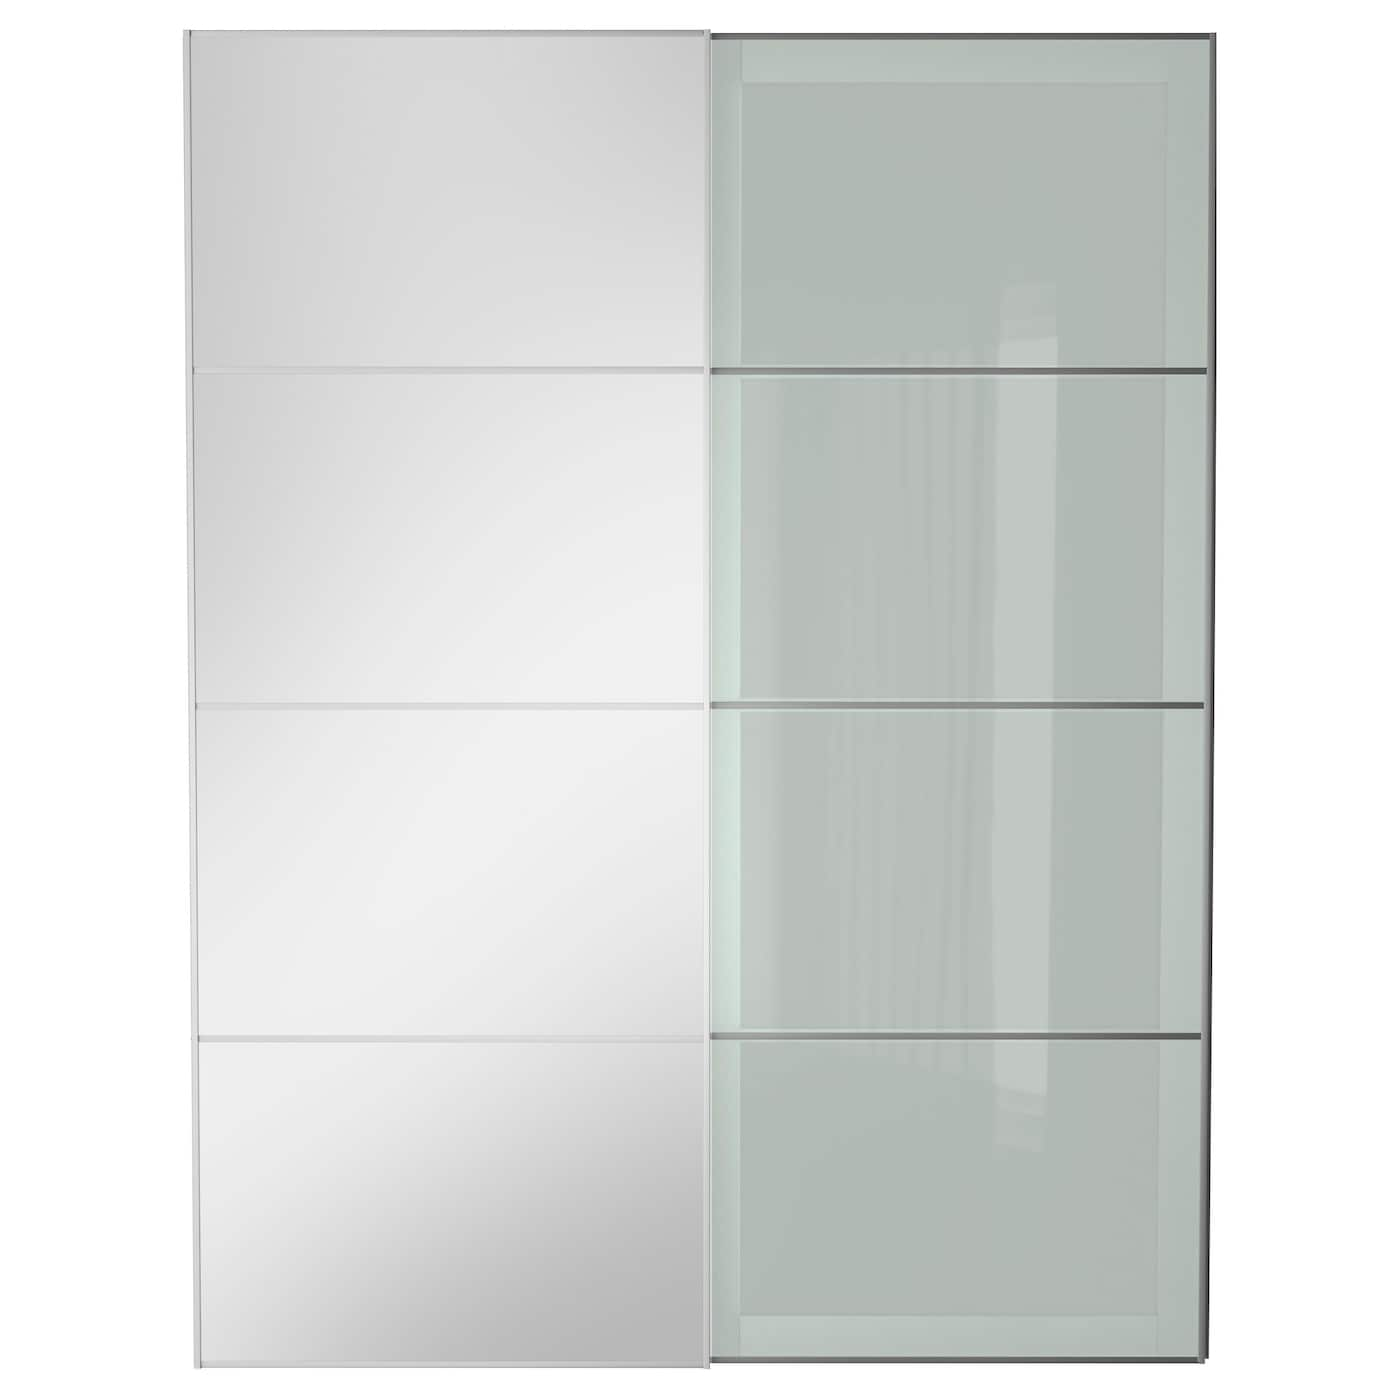 AULI SEKKEN Pair Of Sliding Doors Mirror Glass Frosted Glass 150x201 Cm IKEA